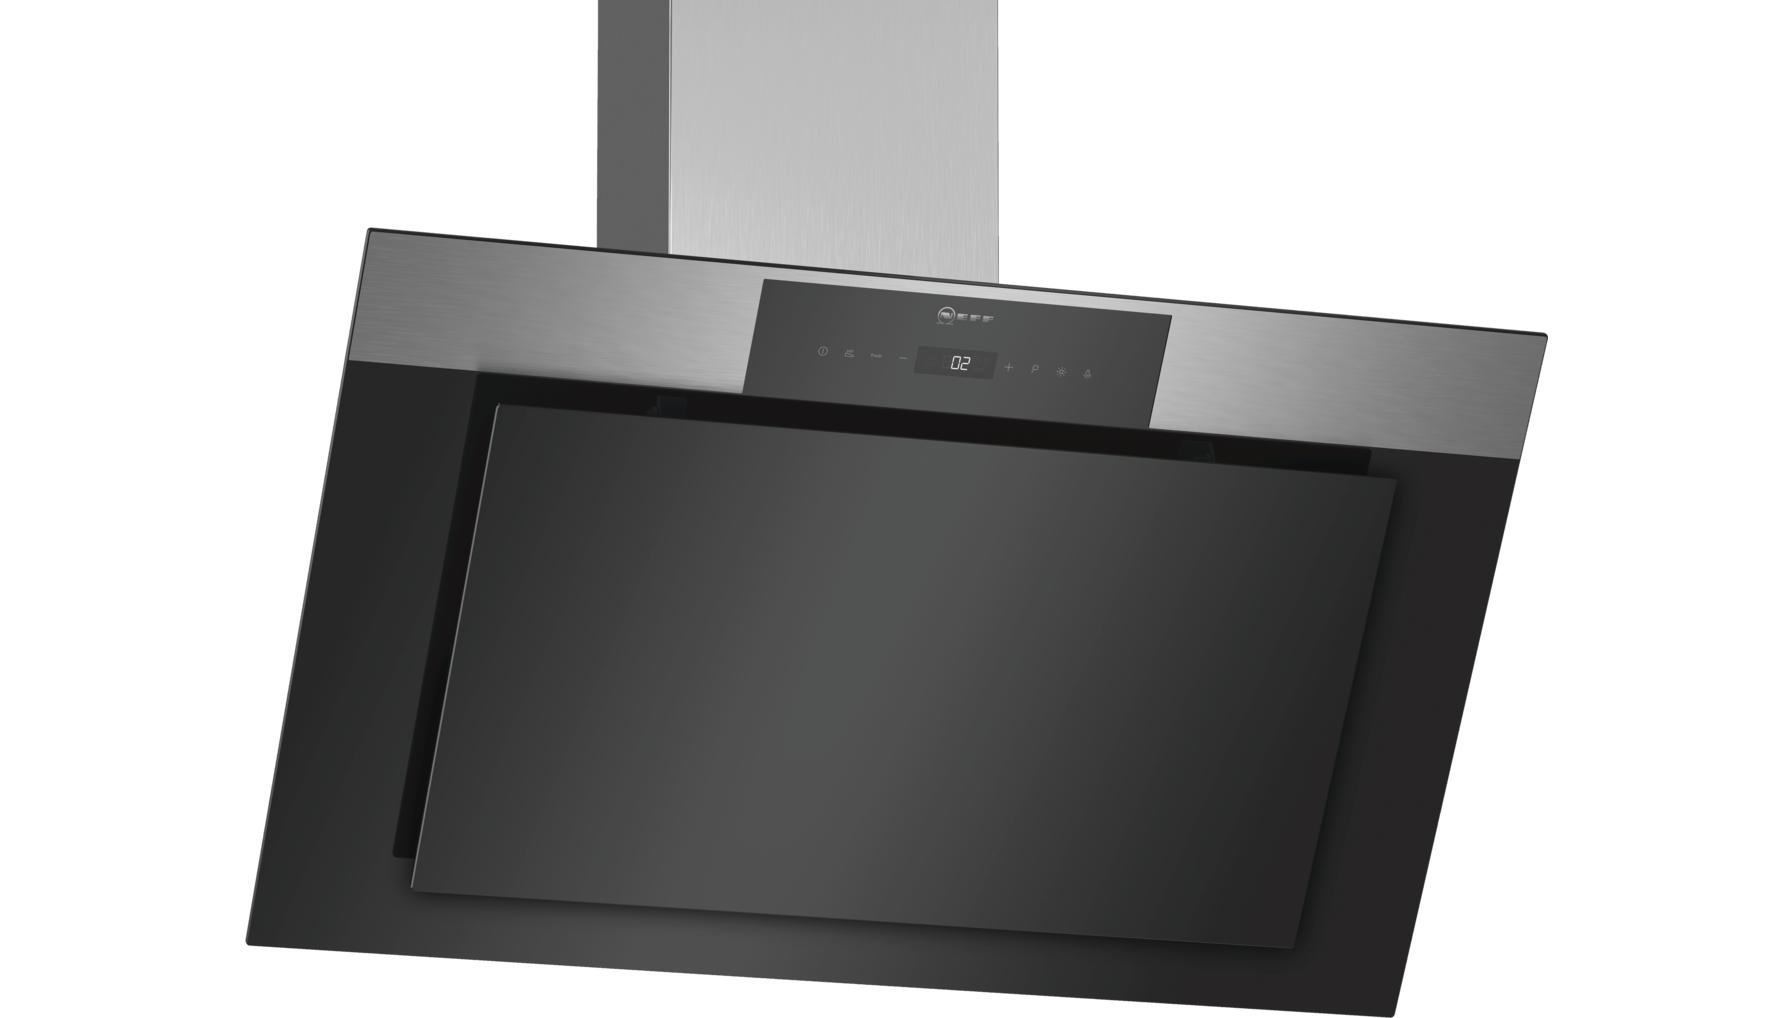 neff produkte dunstabzugshauben wandessen d96ipt1n0. Black Bedroom Furniture Sets. Home Design Ideas